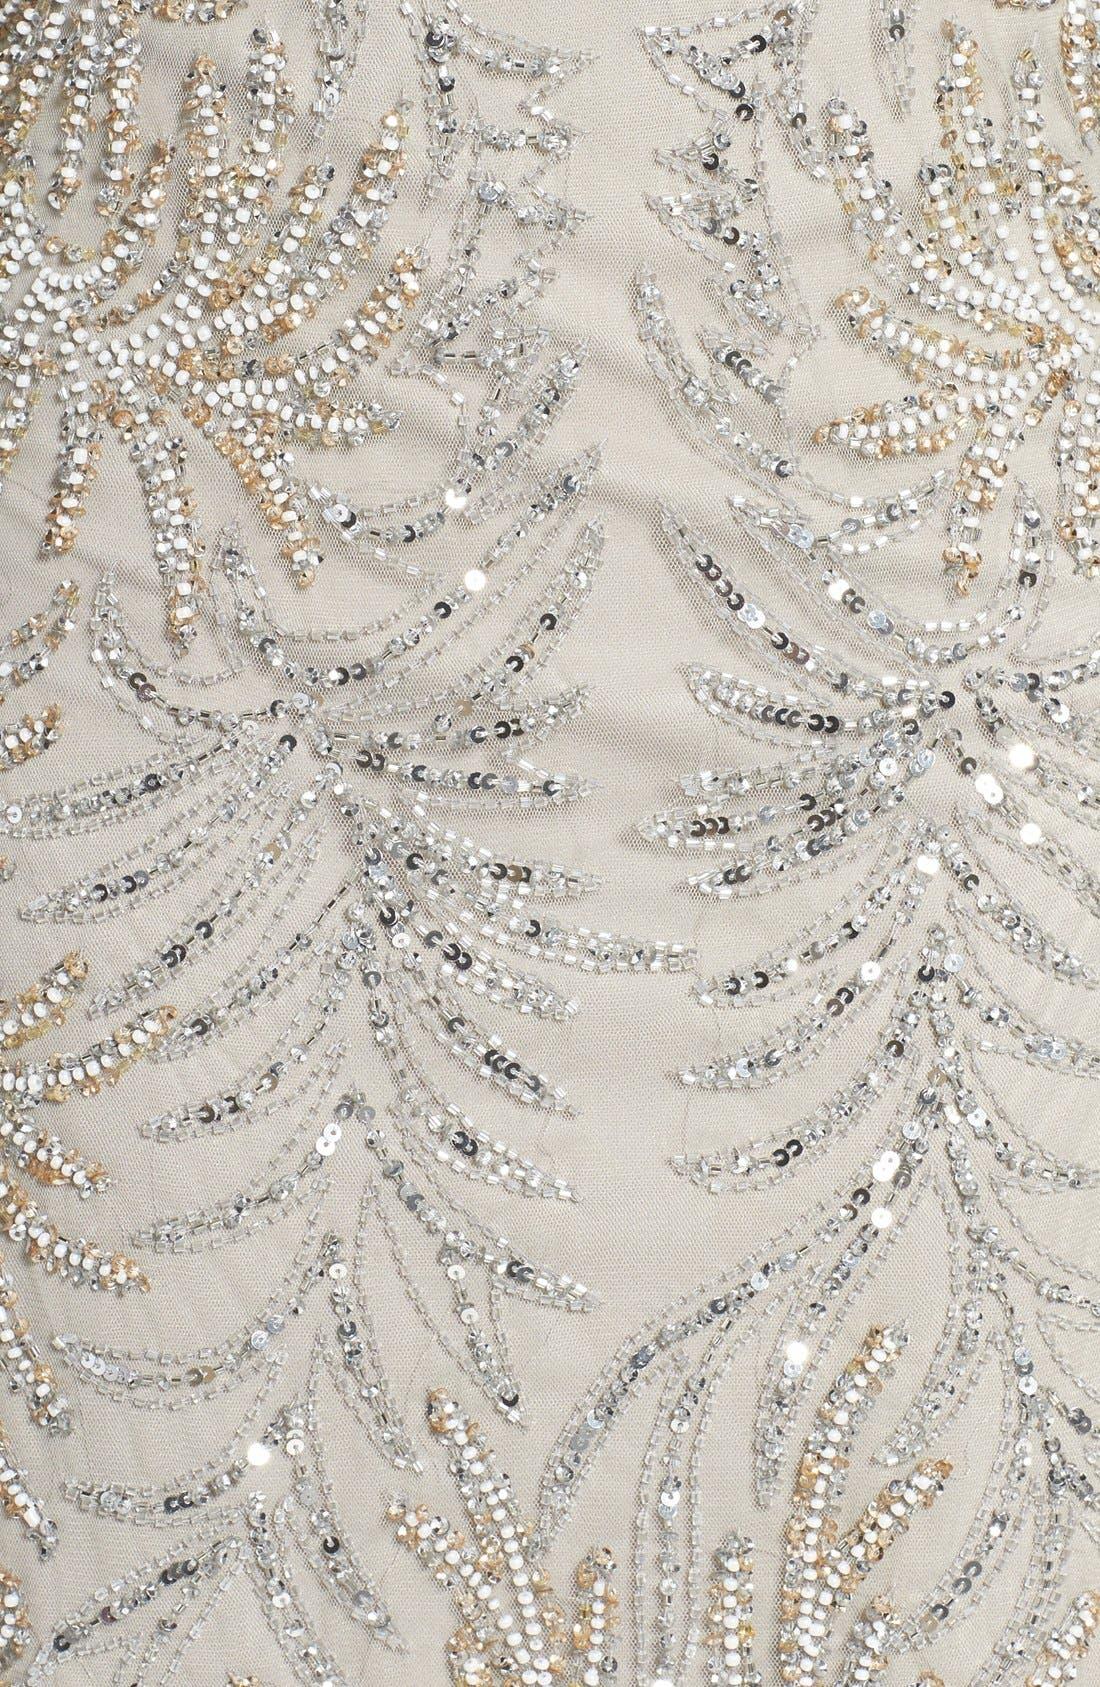 Embellished Mesh Sheath Dress,                             Alternate thumbnail 6, color,                             040